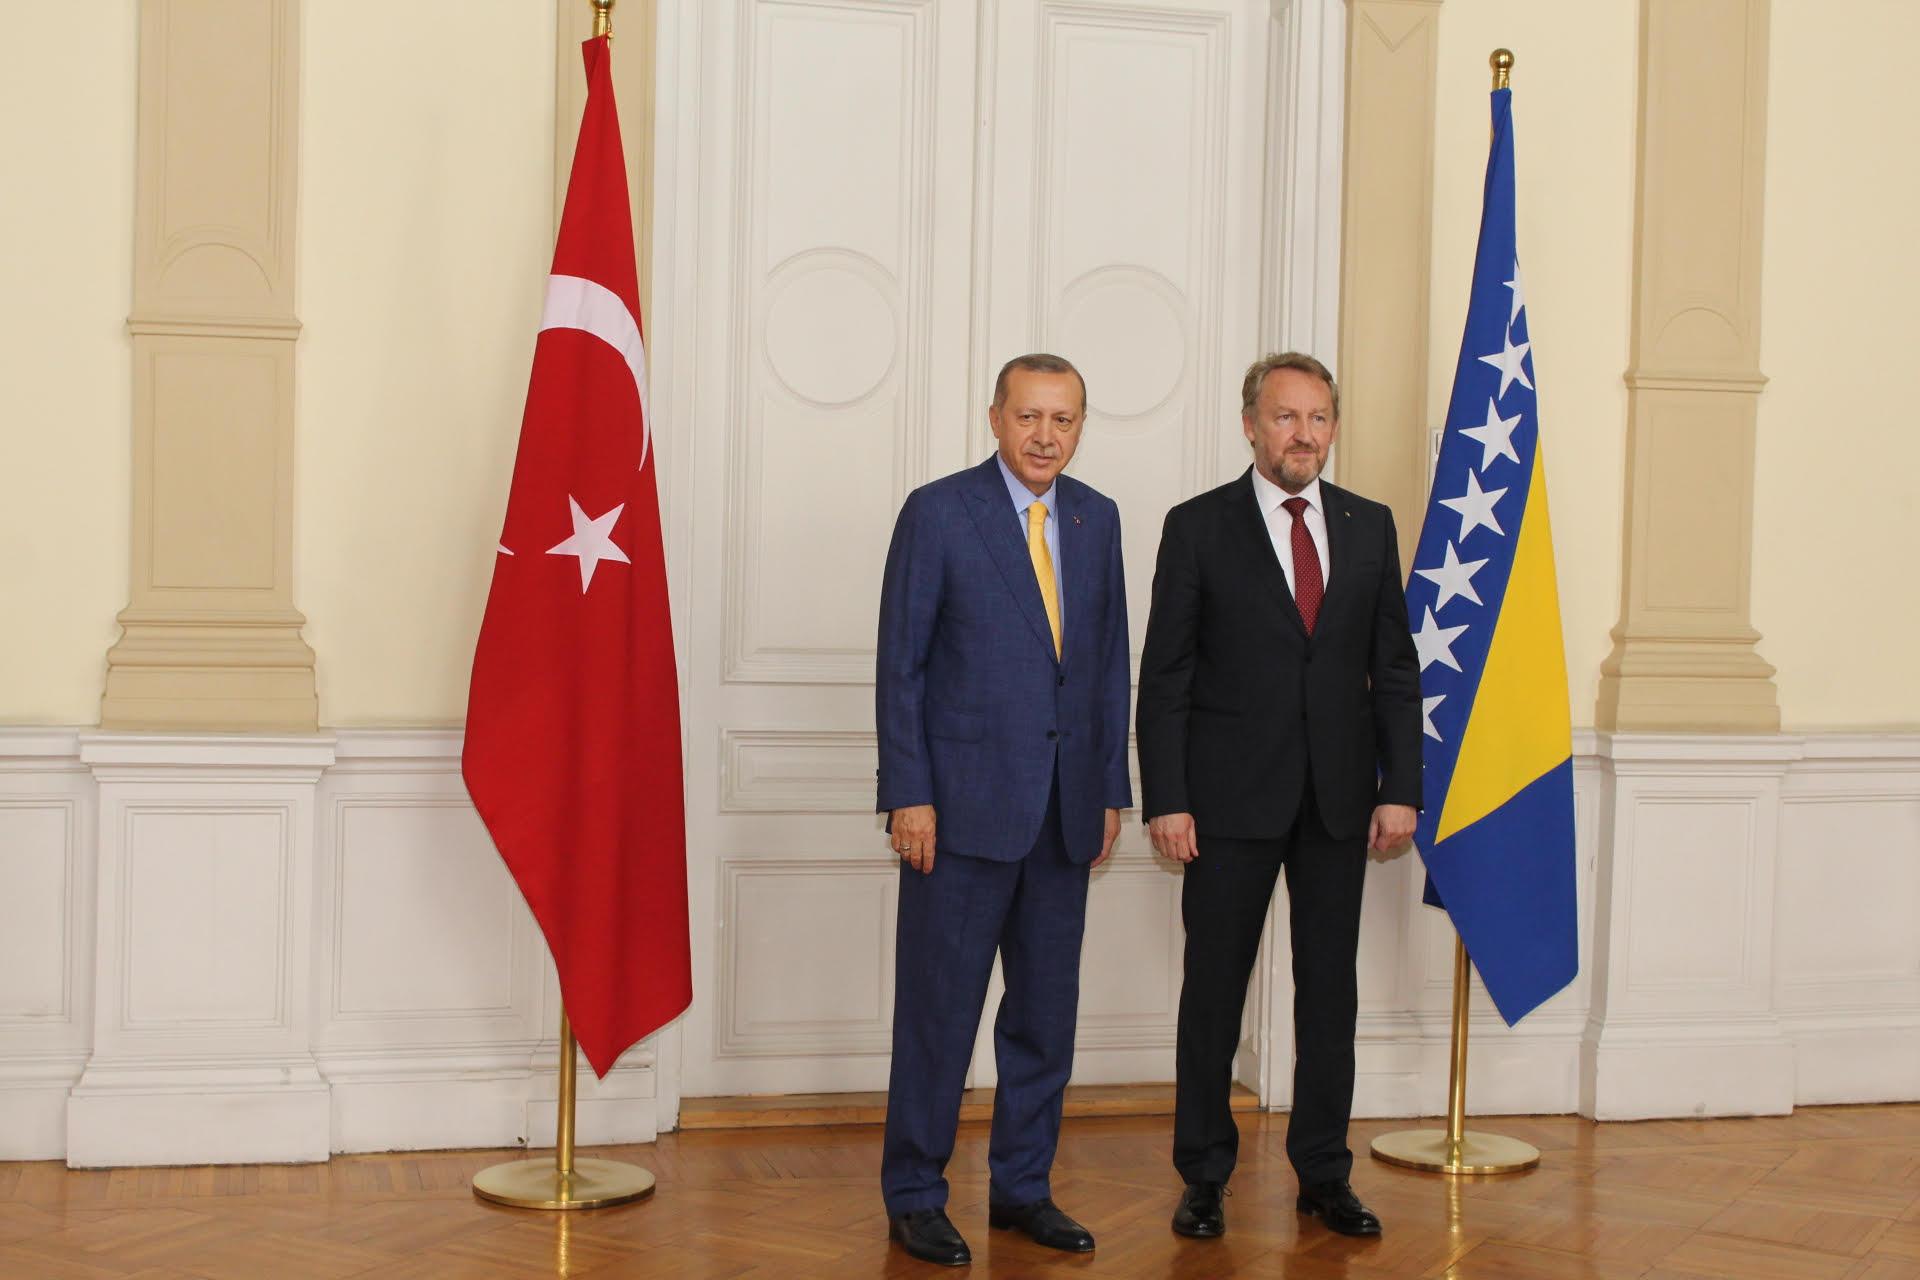 Erdogan in Bosnia Herzegovina on an official visit